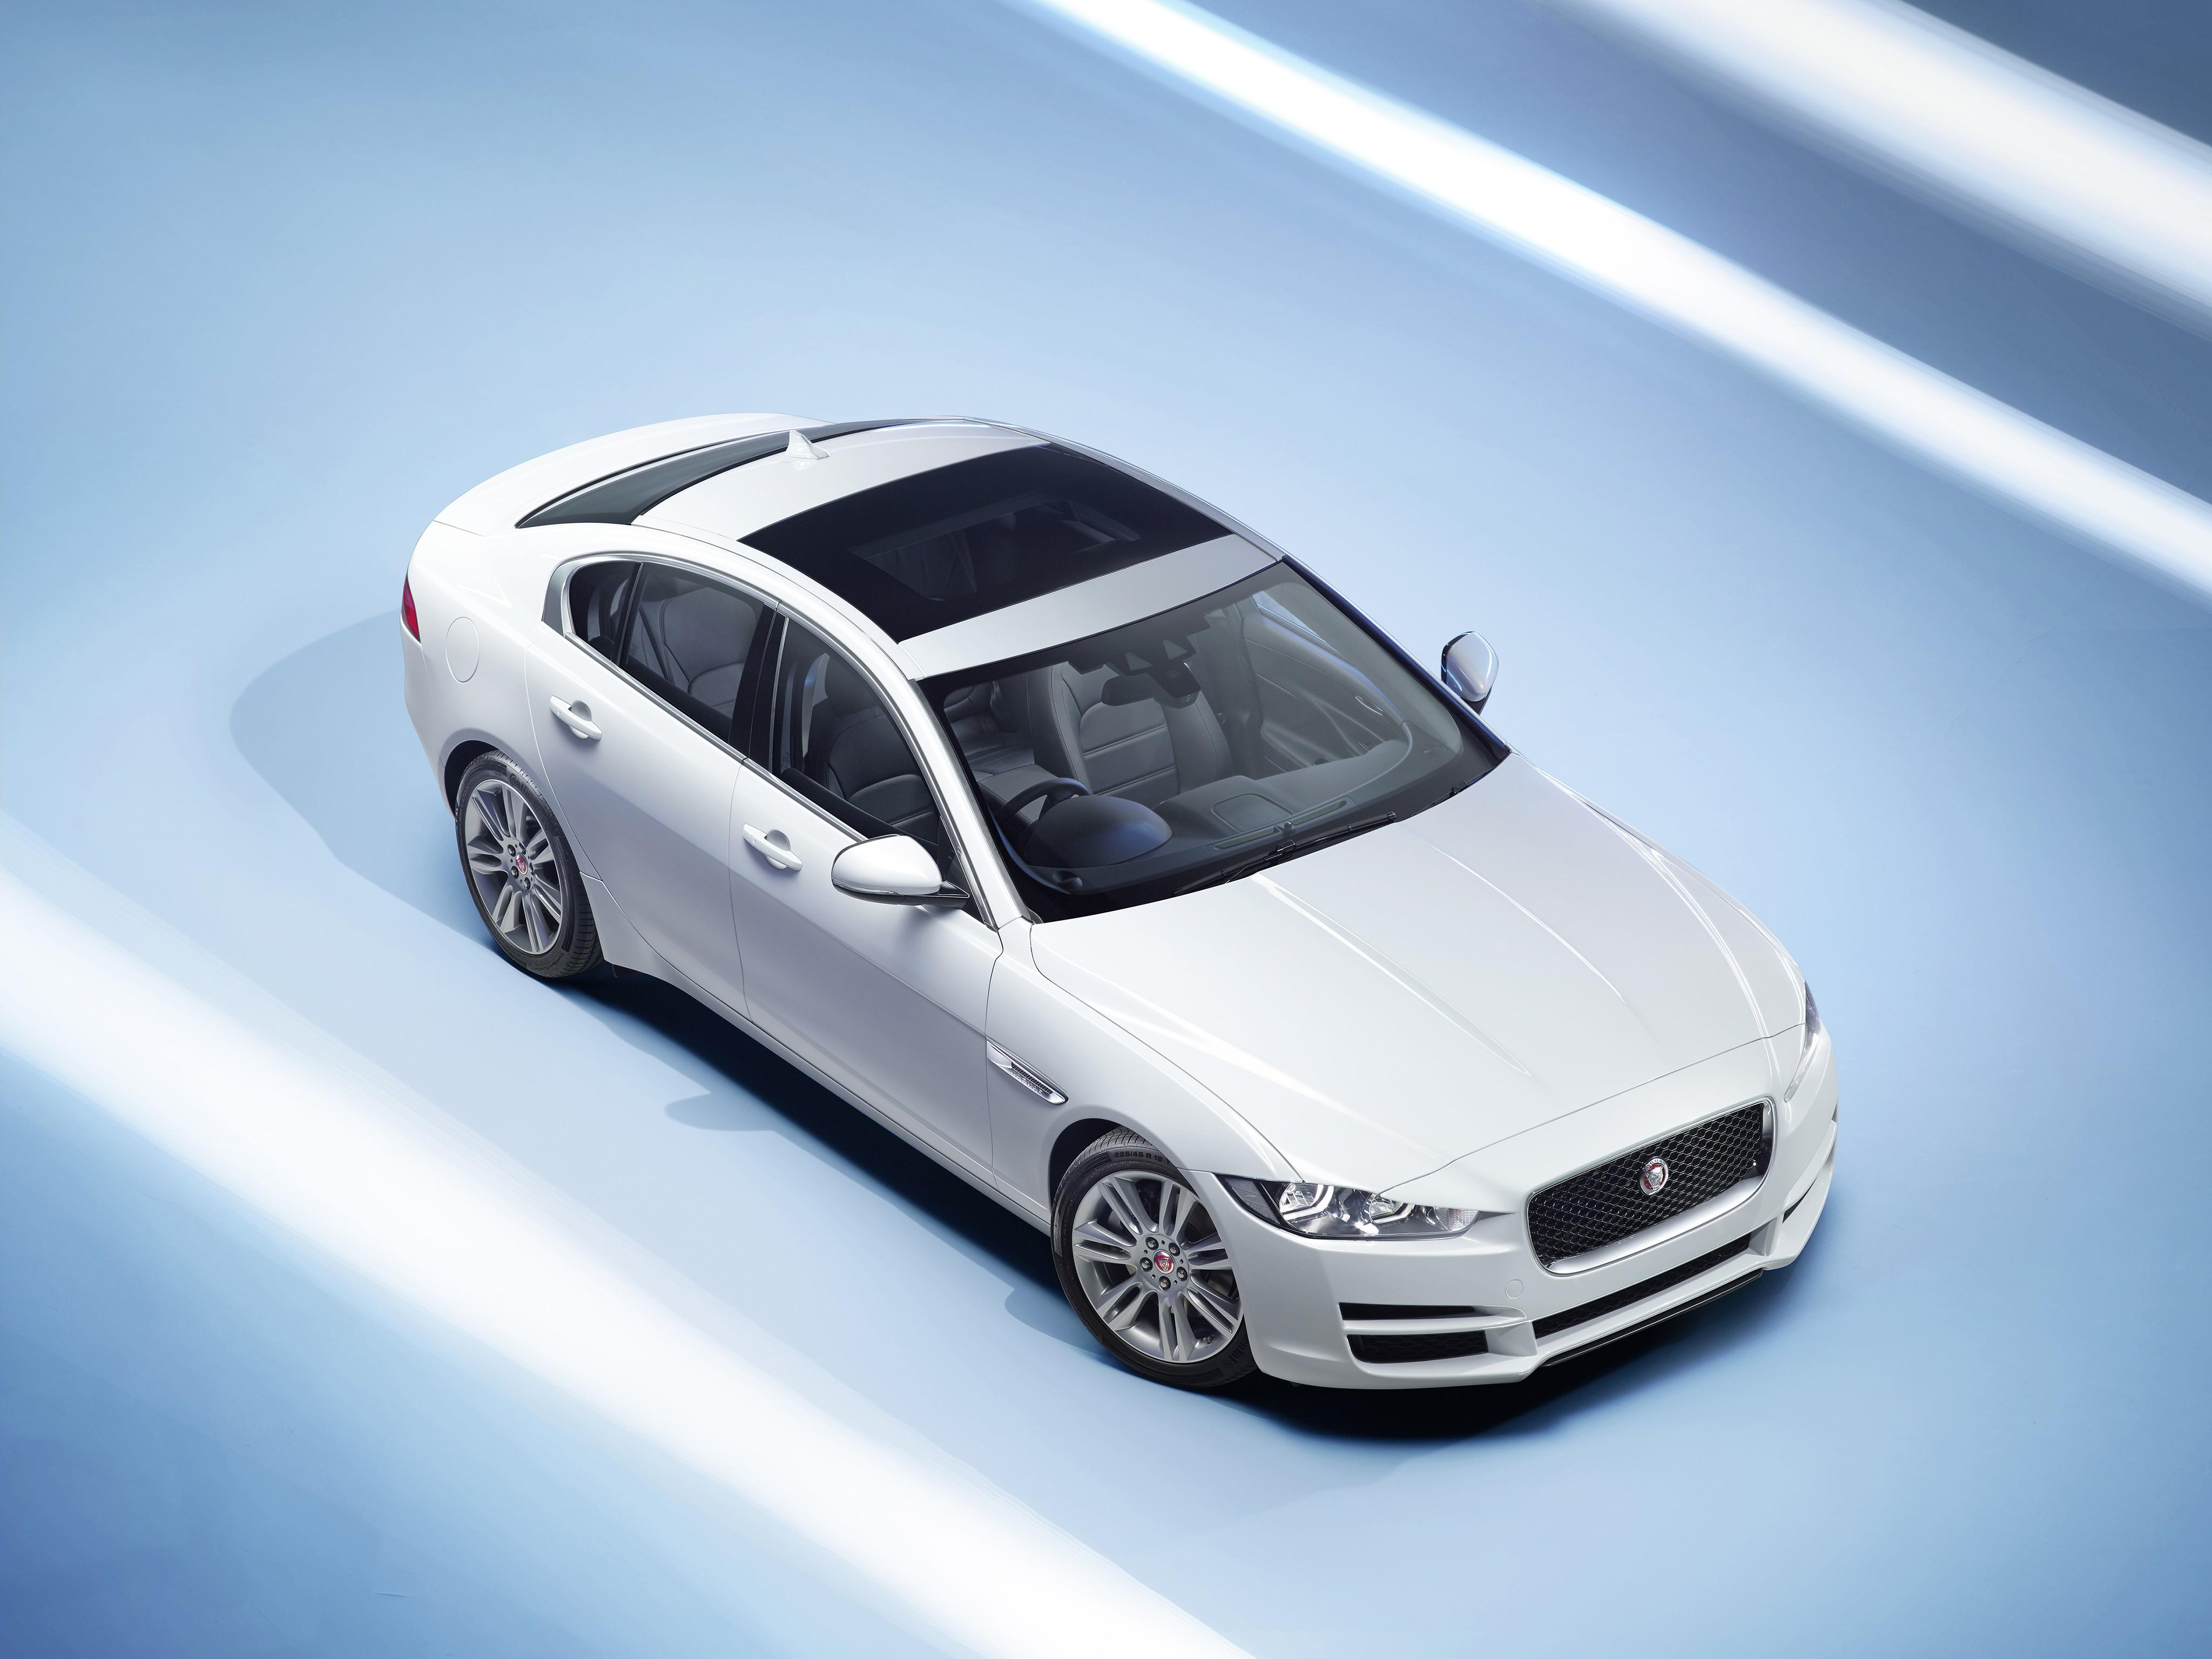 enthusiast news community c motion automotive acura car jaguar page acurazine forums revealed